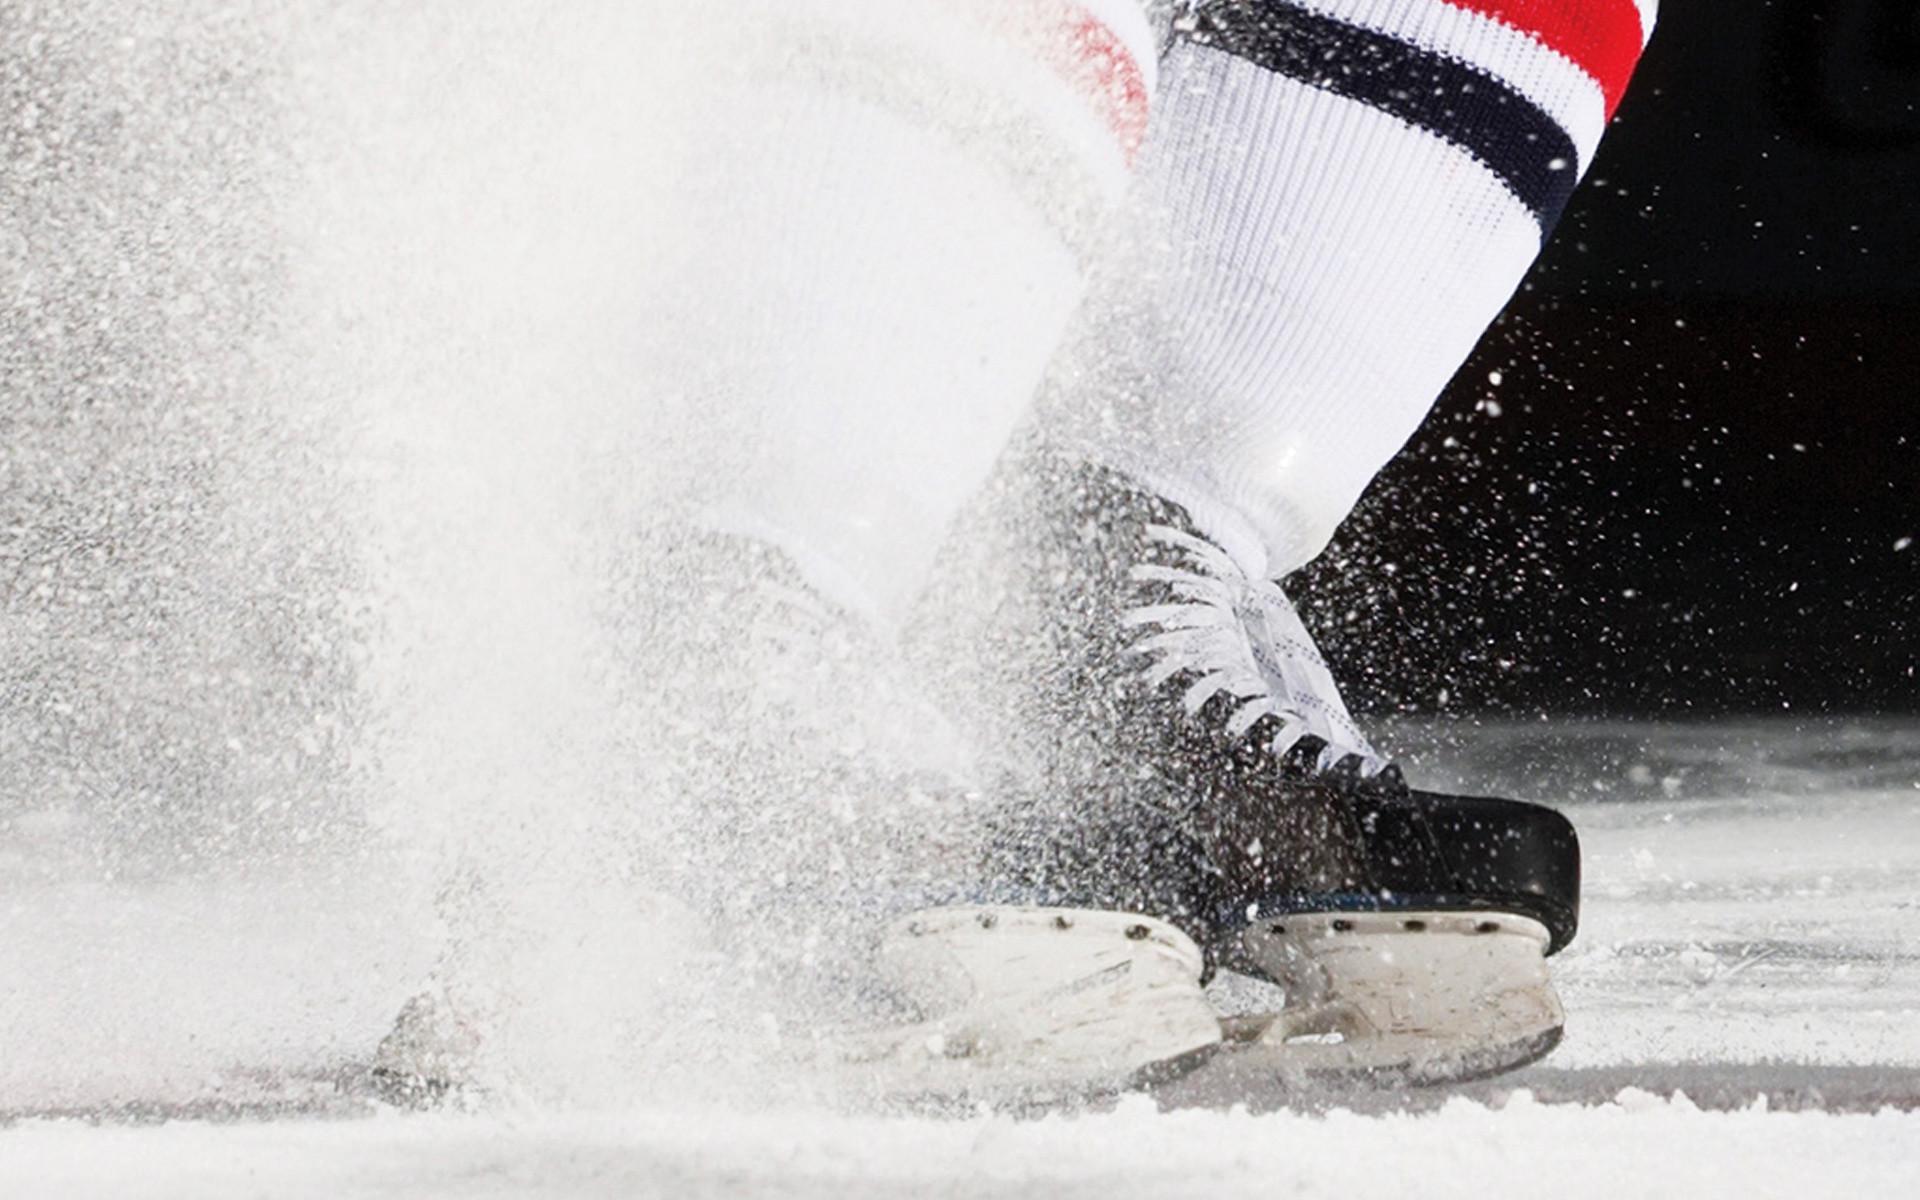 Preview Hockey Wallpaper   feelgrafix.com   Pinterest   Hockey sport,  Sports images and Hockey